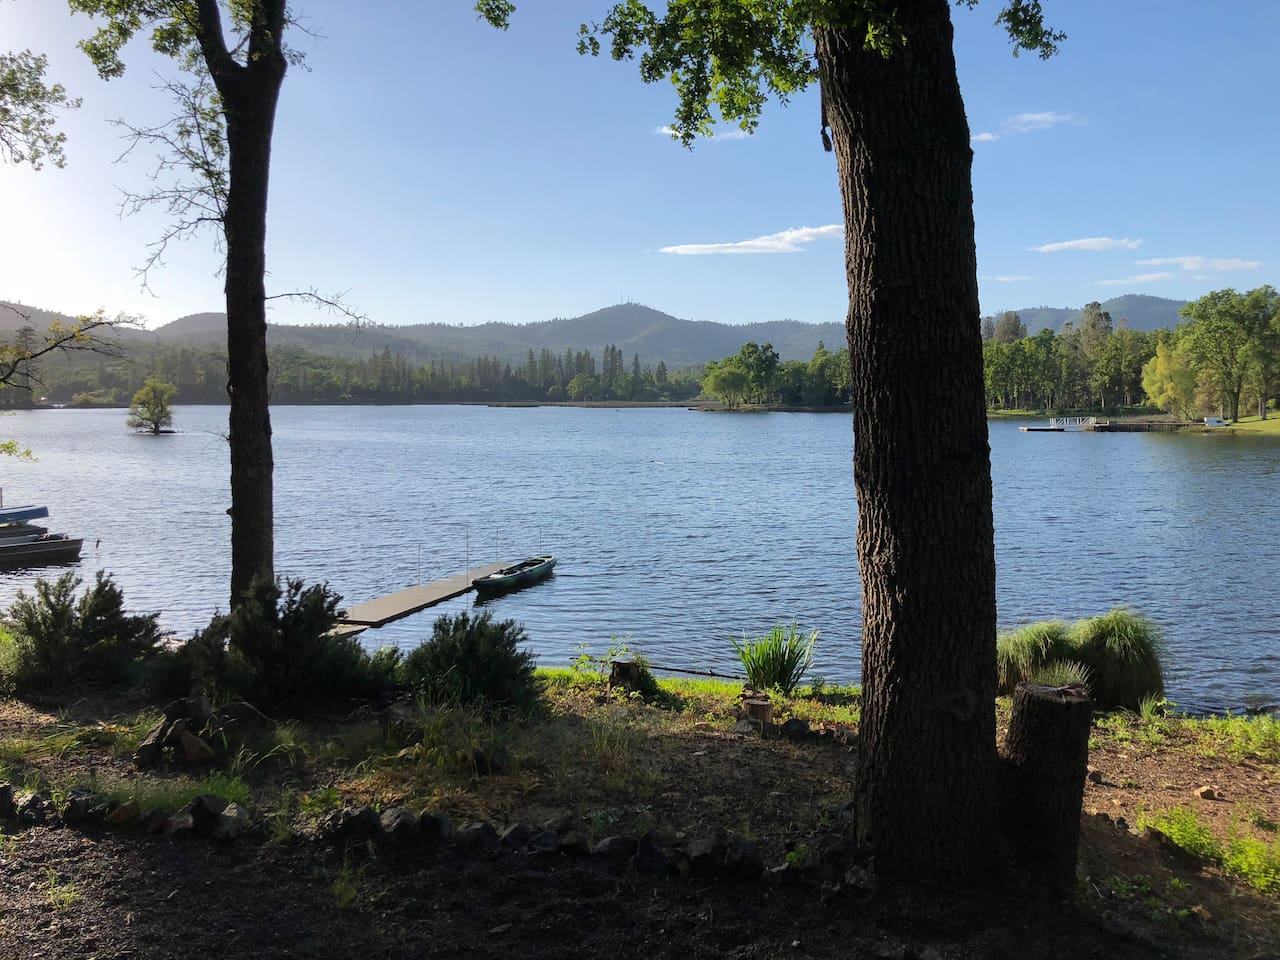 Kayak or fish the lake